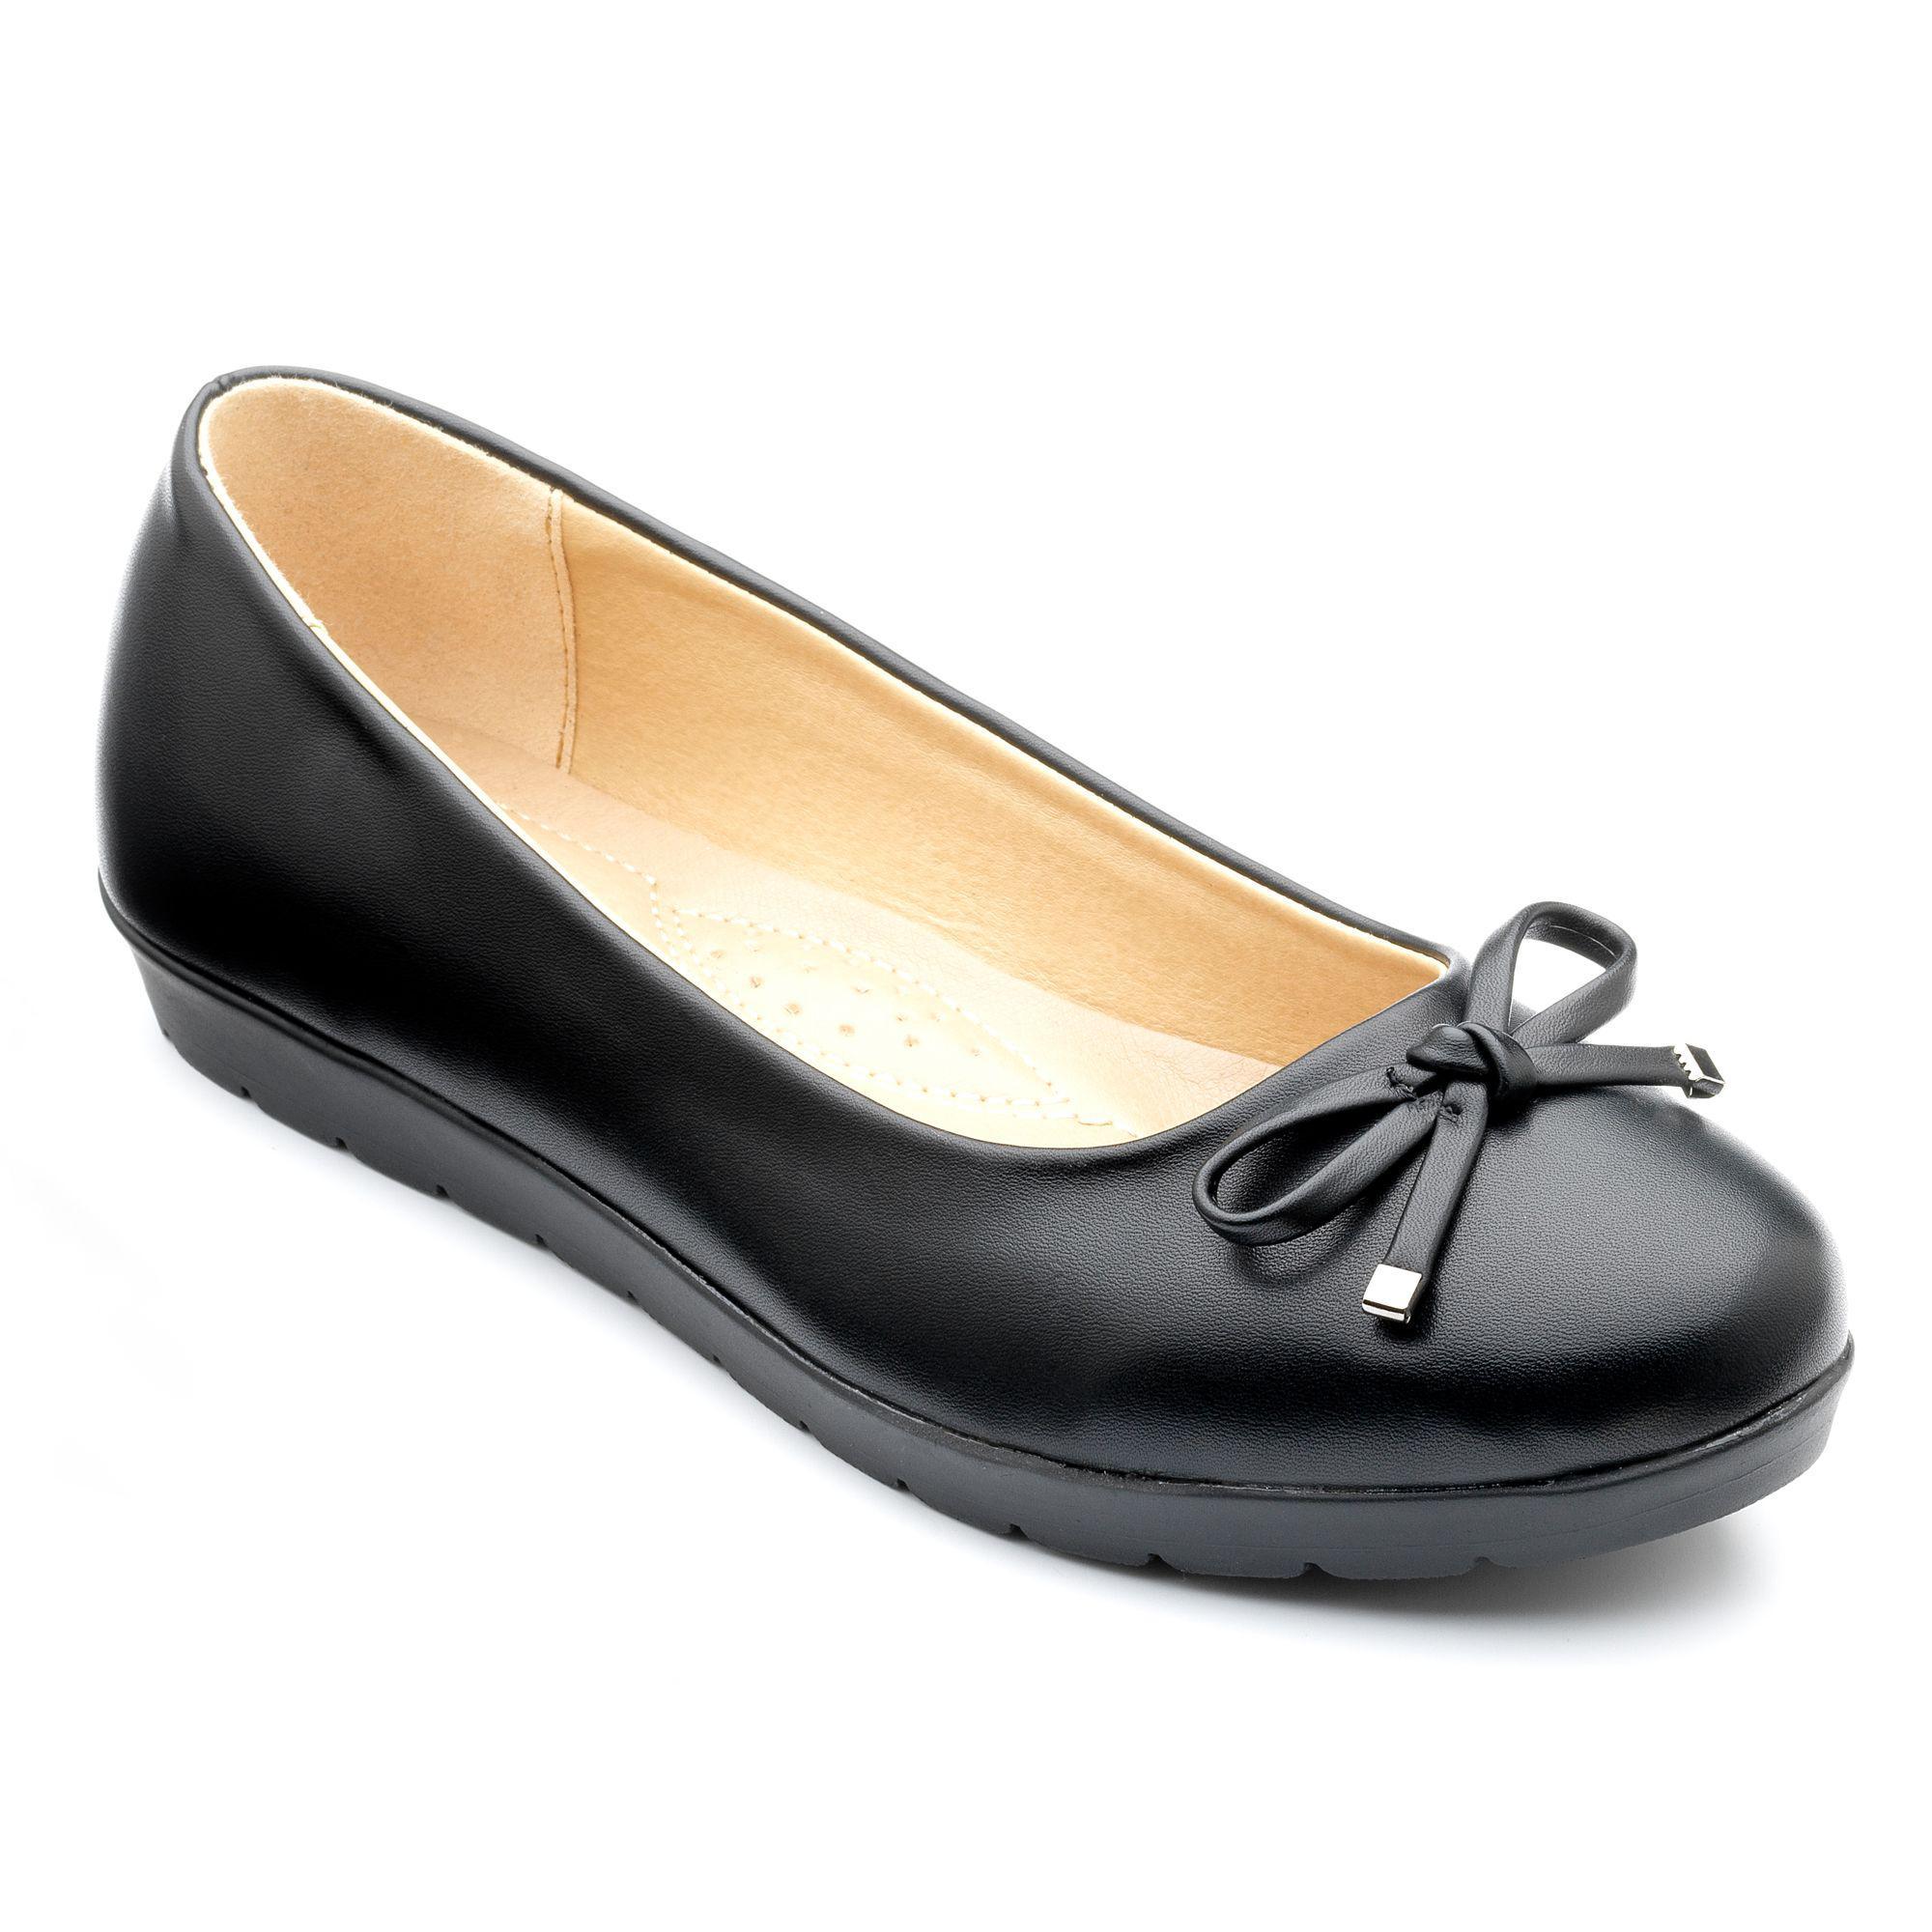 Black matt 'elizabeth' ballerina shoes browse cheap price buy cheap for nice 6D1yv8T9Gd